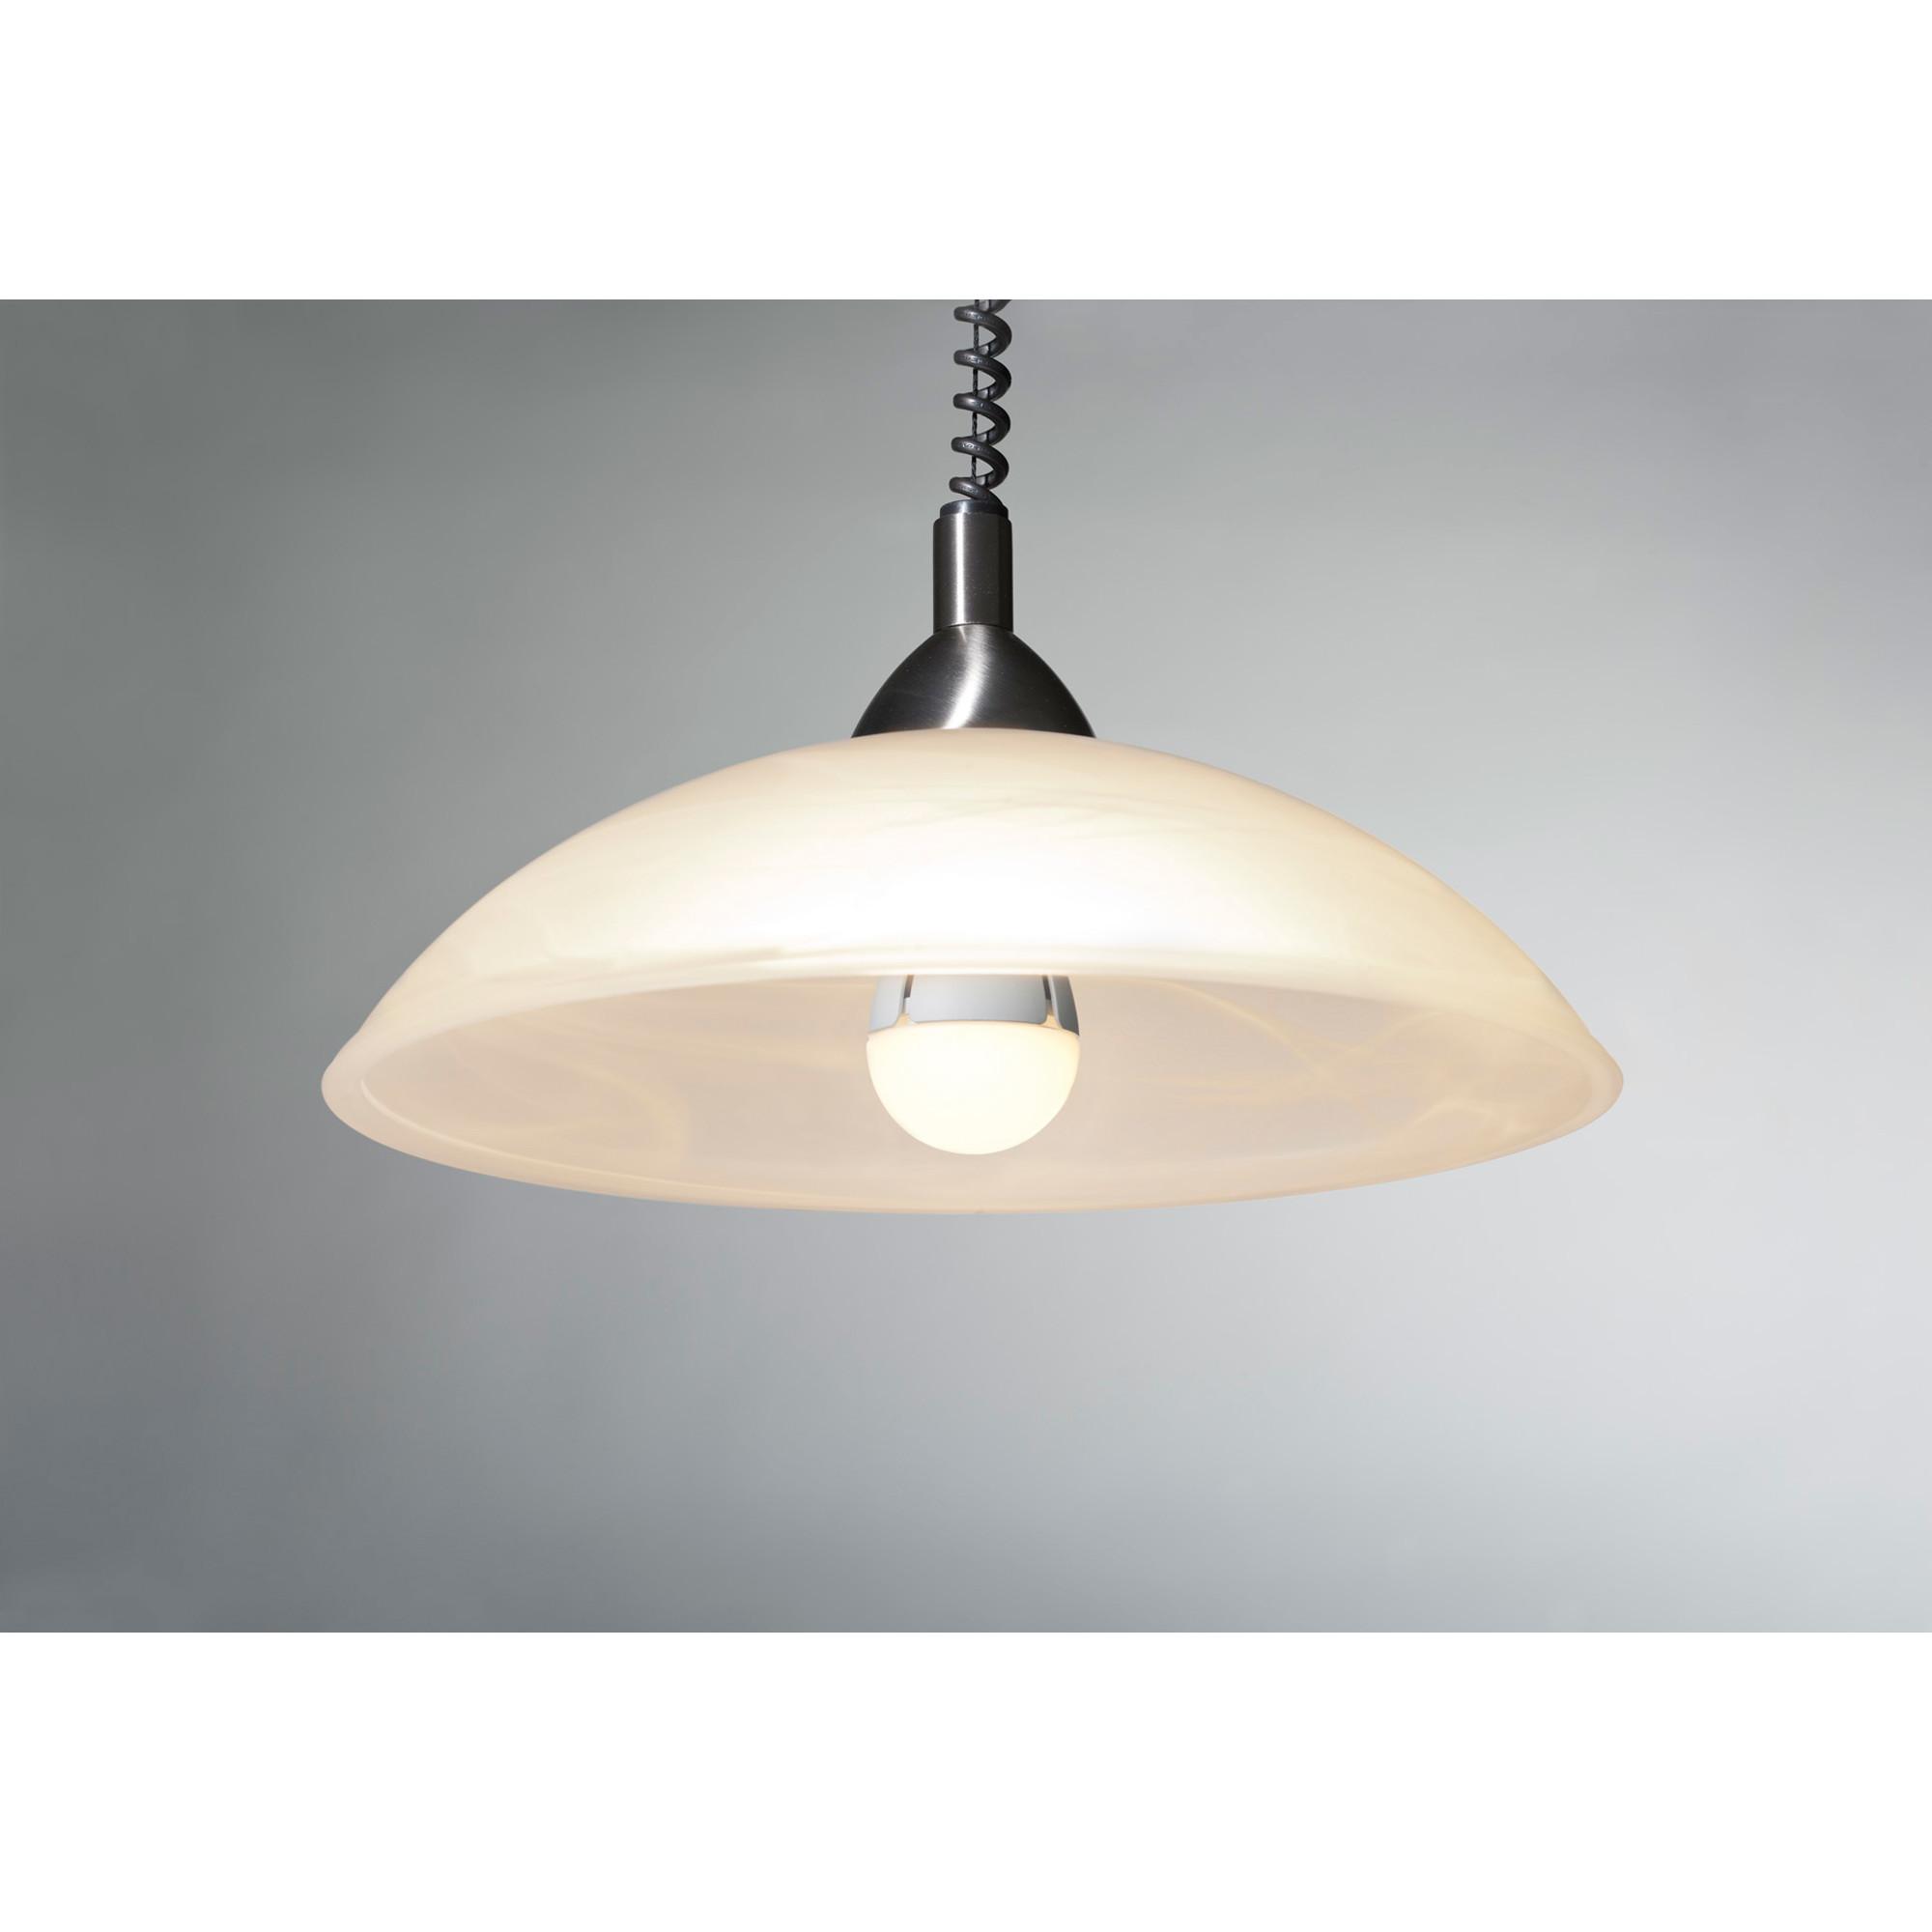 Лампа светодиодная Paulmann 28143 E27 430 Лм теплый свет